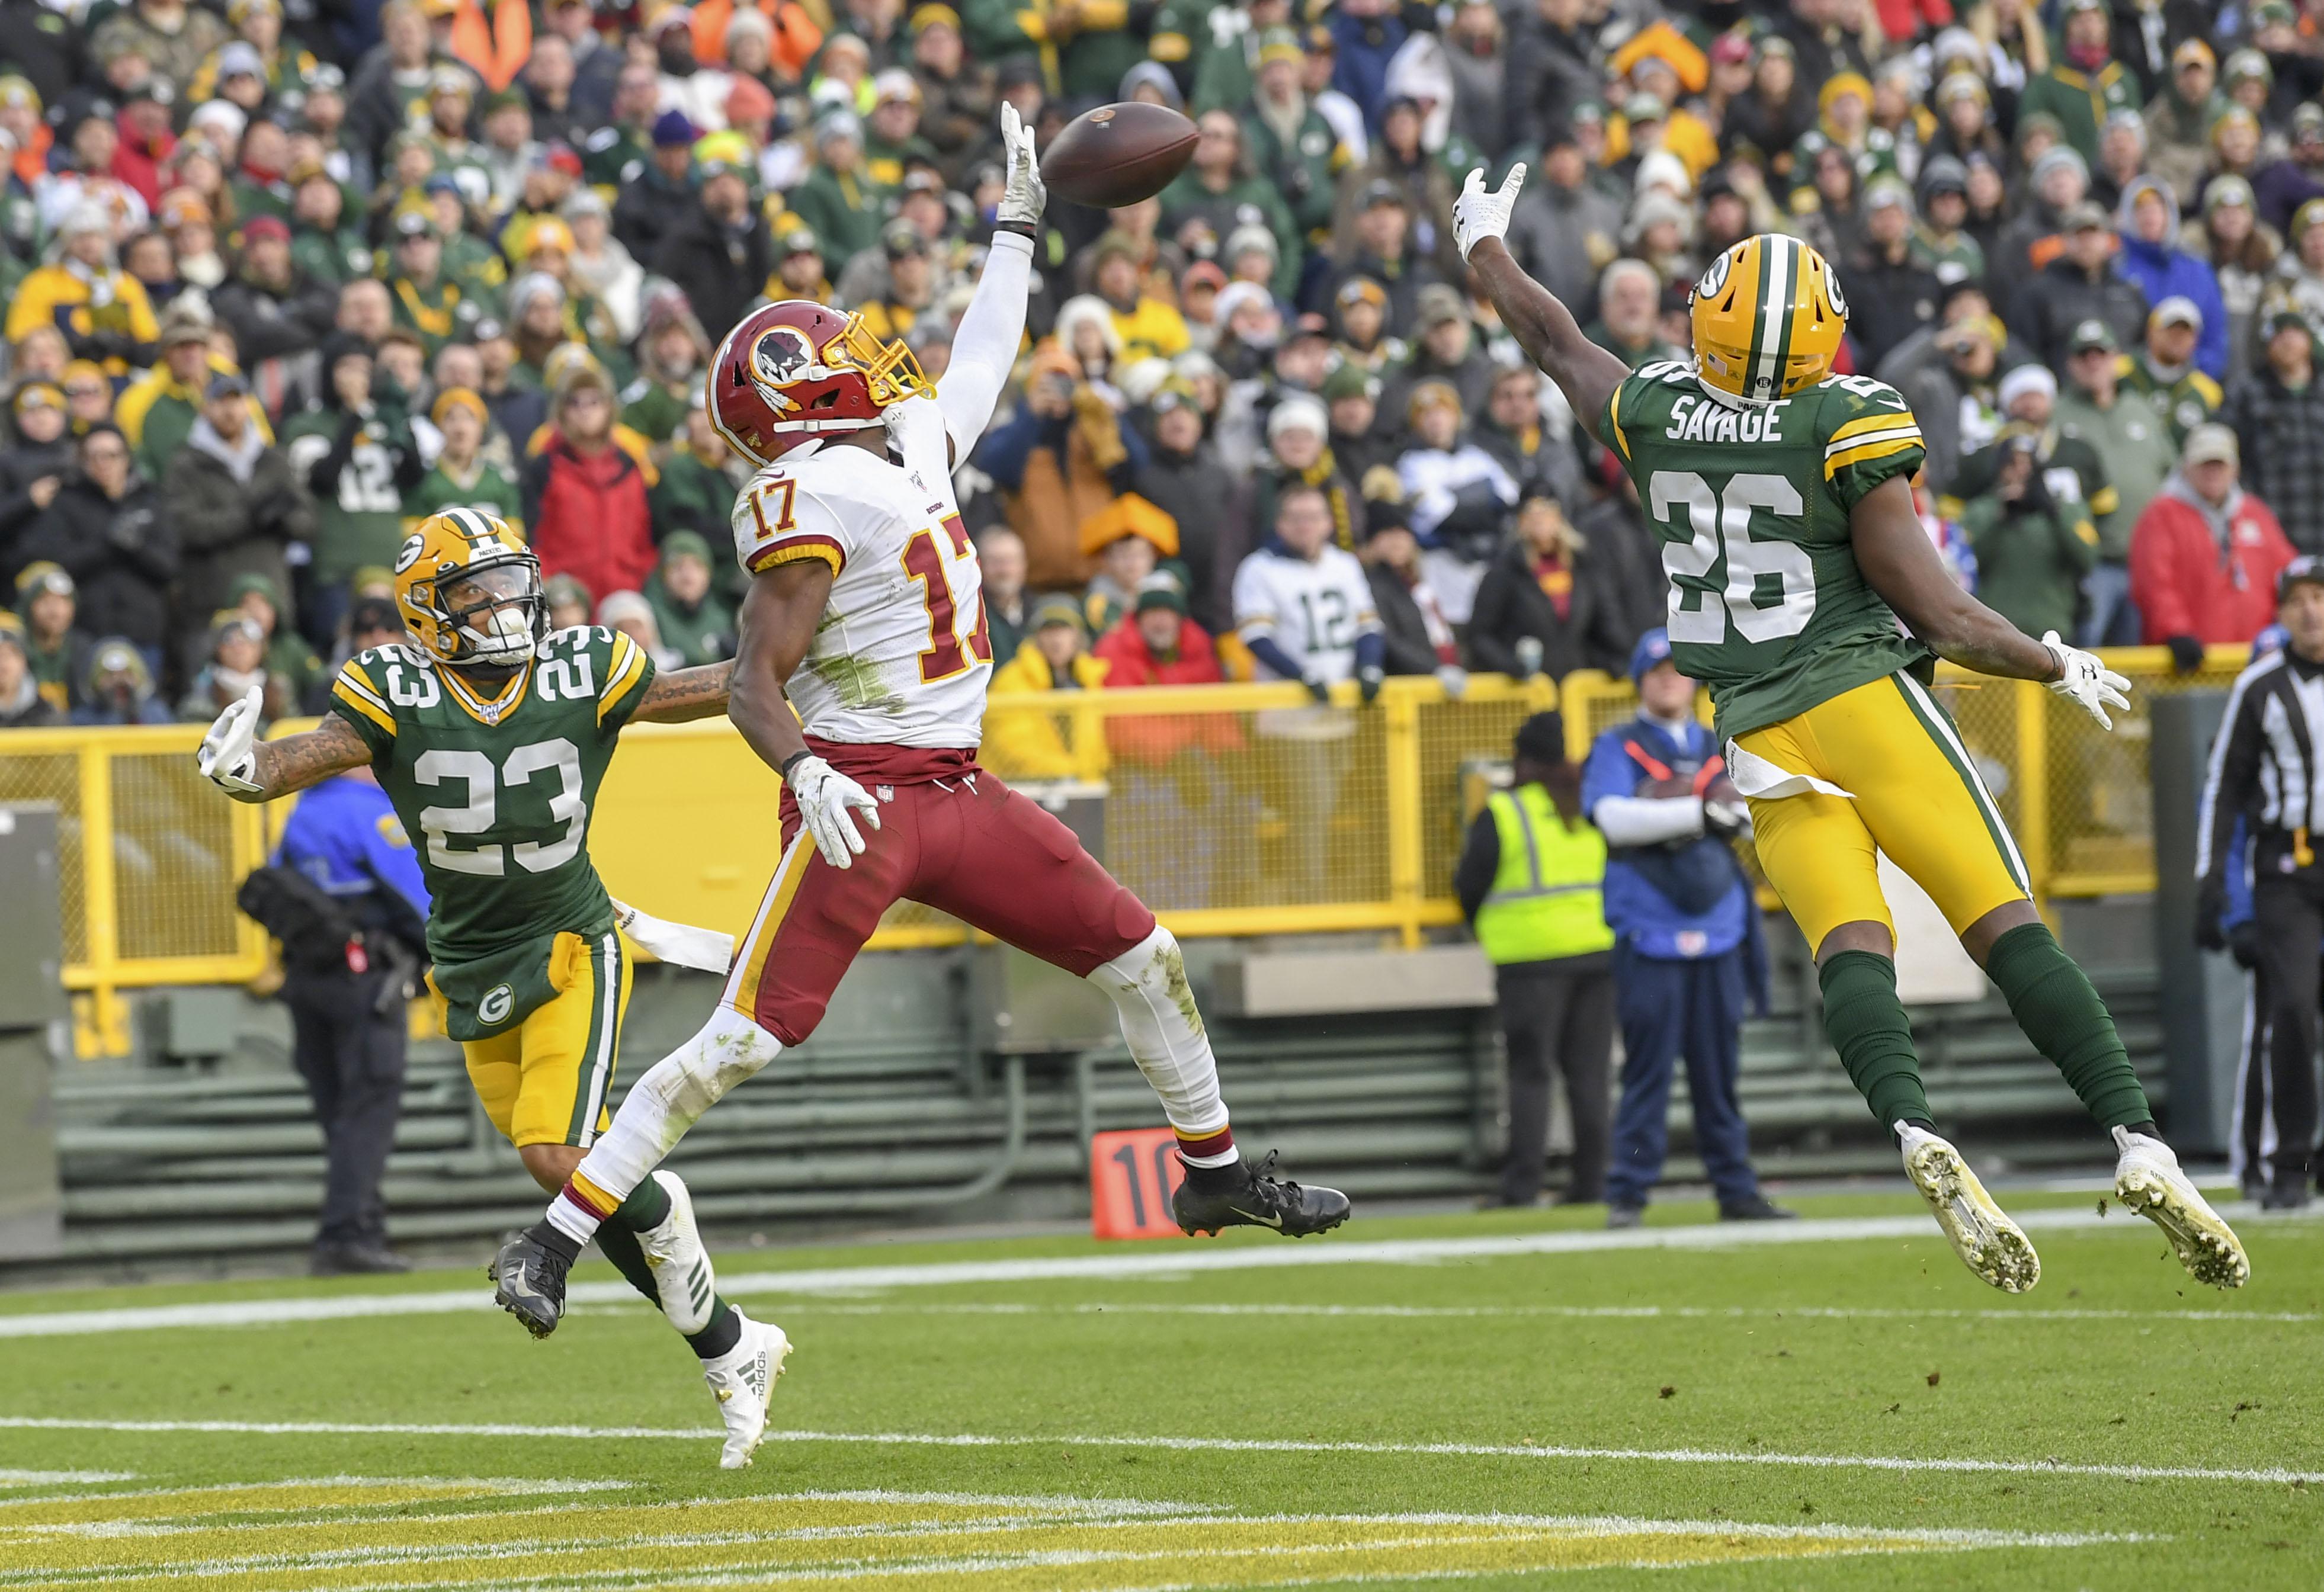 NFL-Washington Redskins at Green Bay Packers